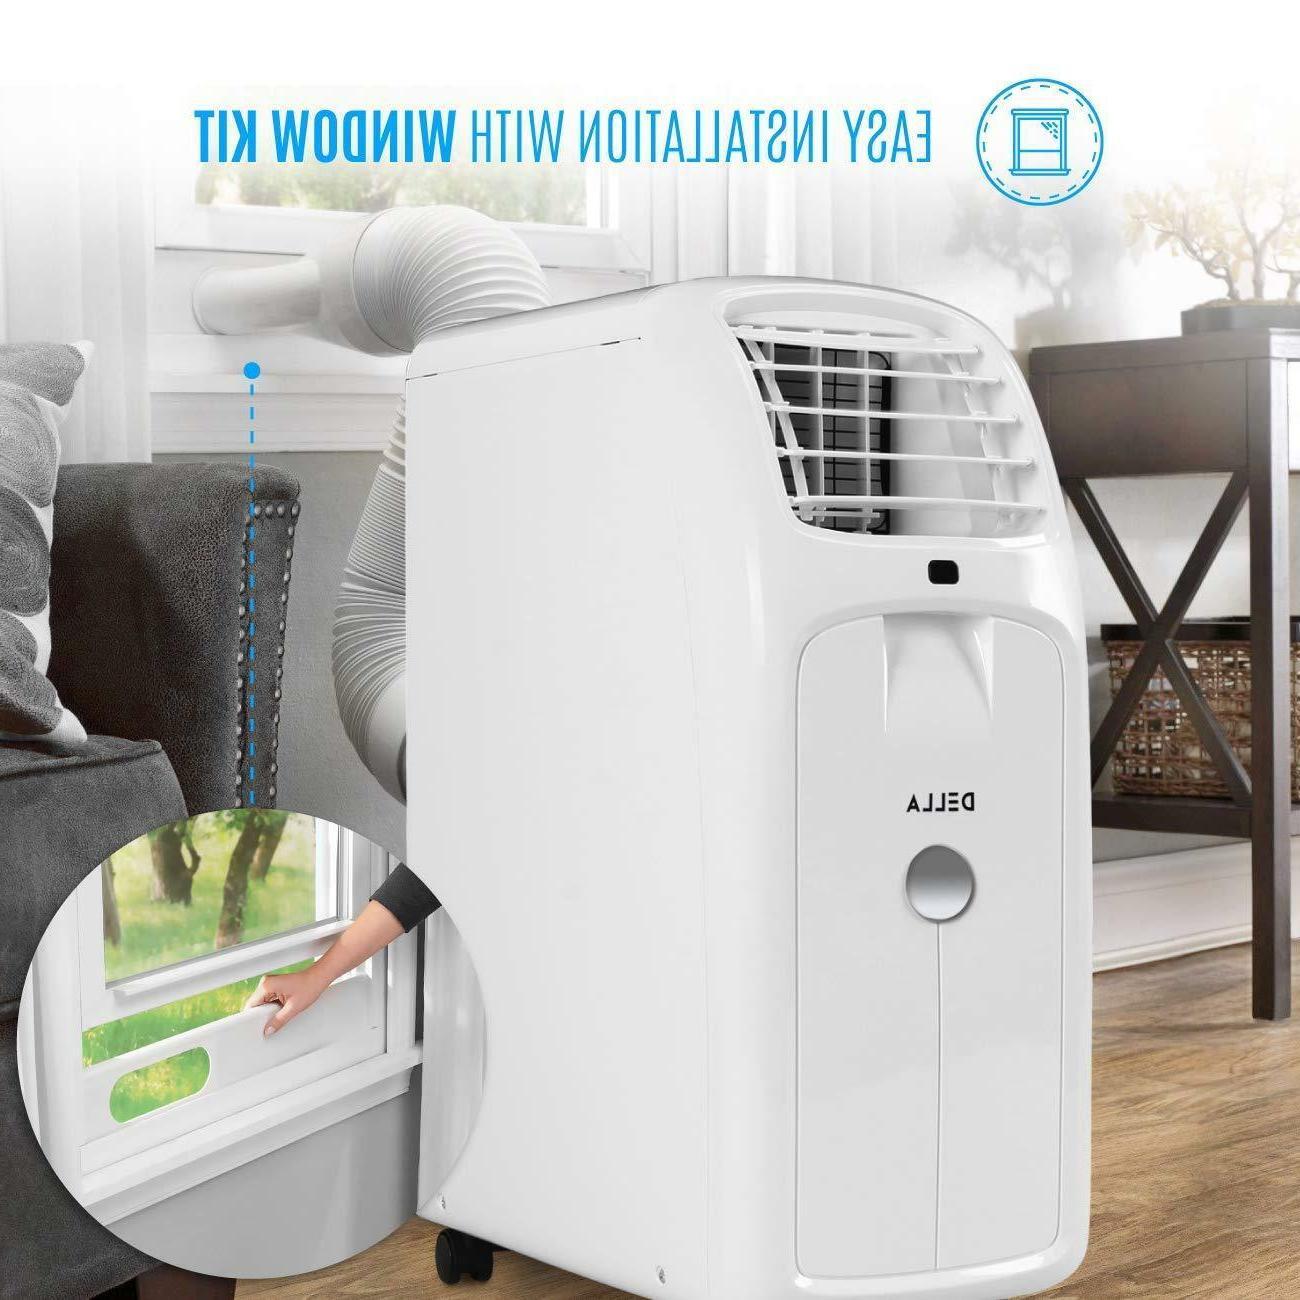 Portable AC 8000 BTU Della Air Conditioner Best Value New